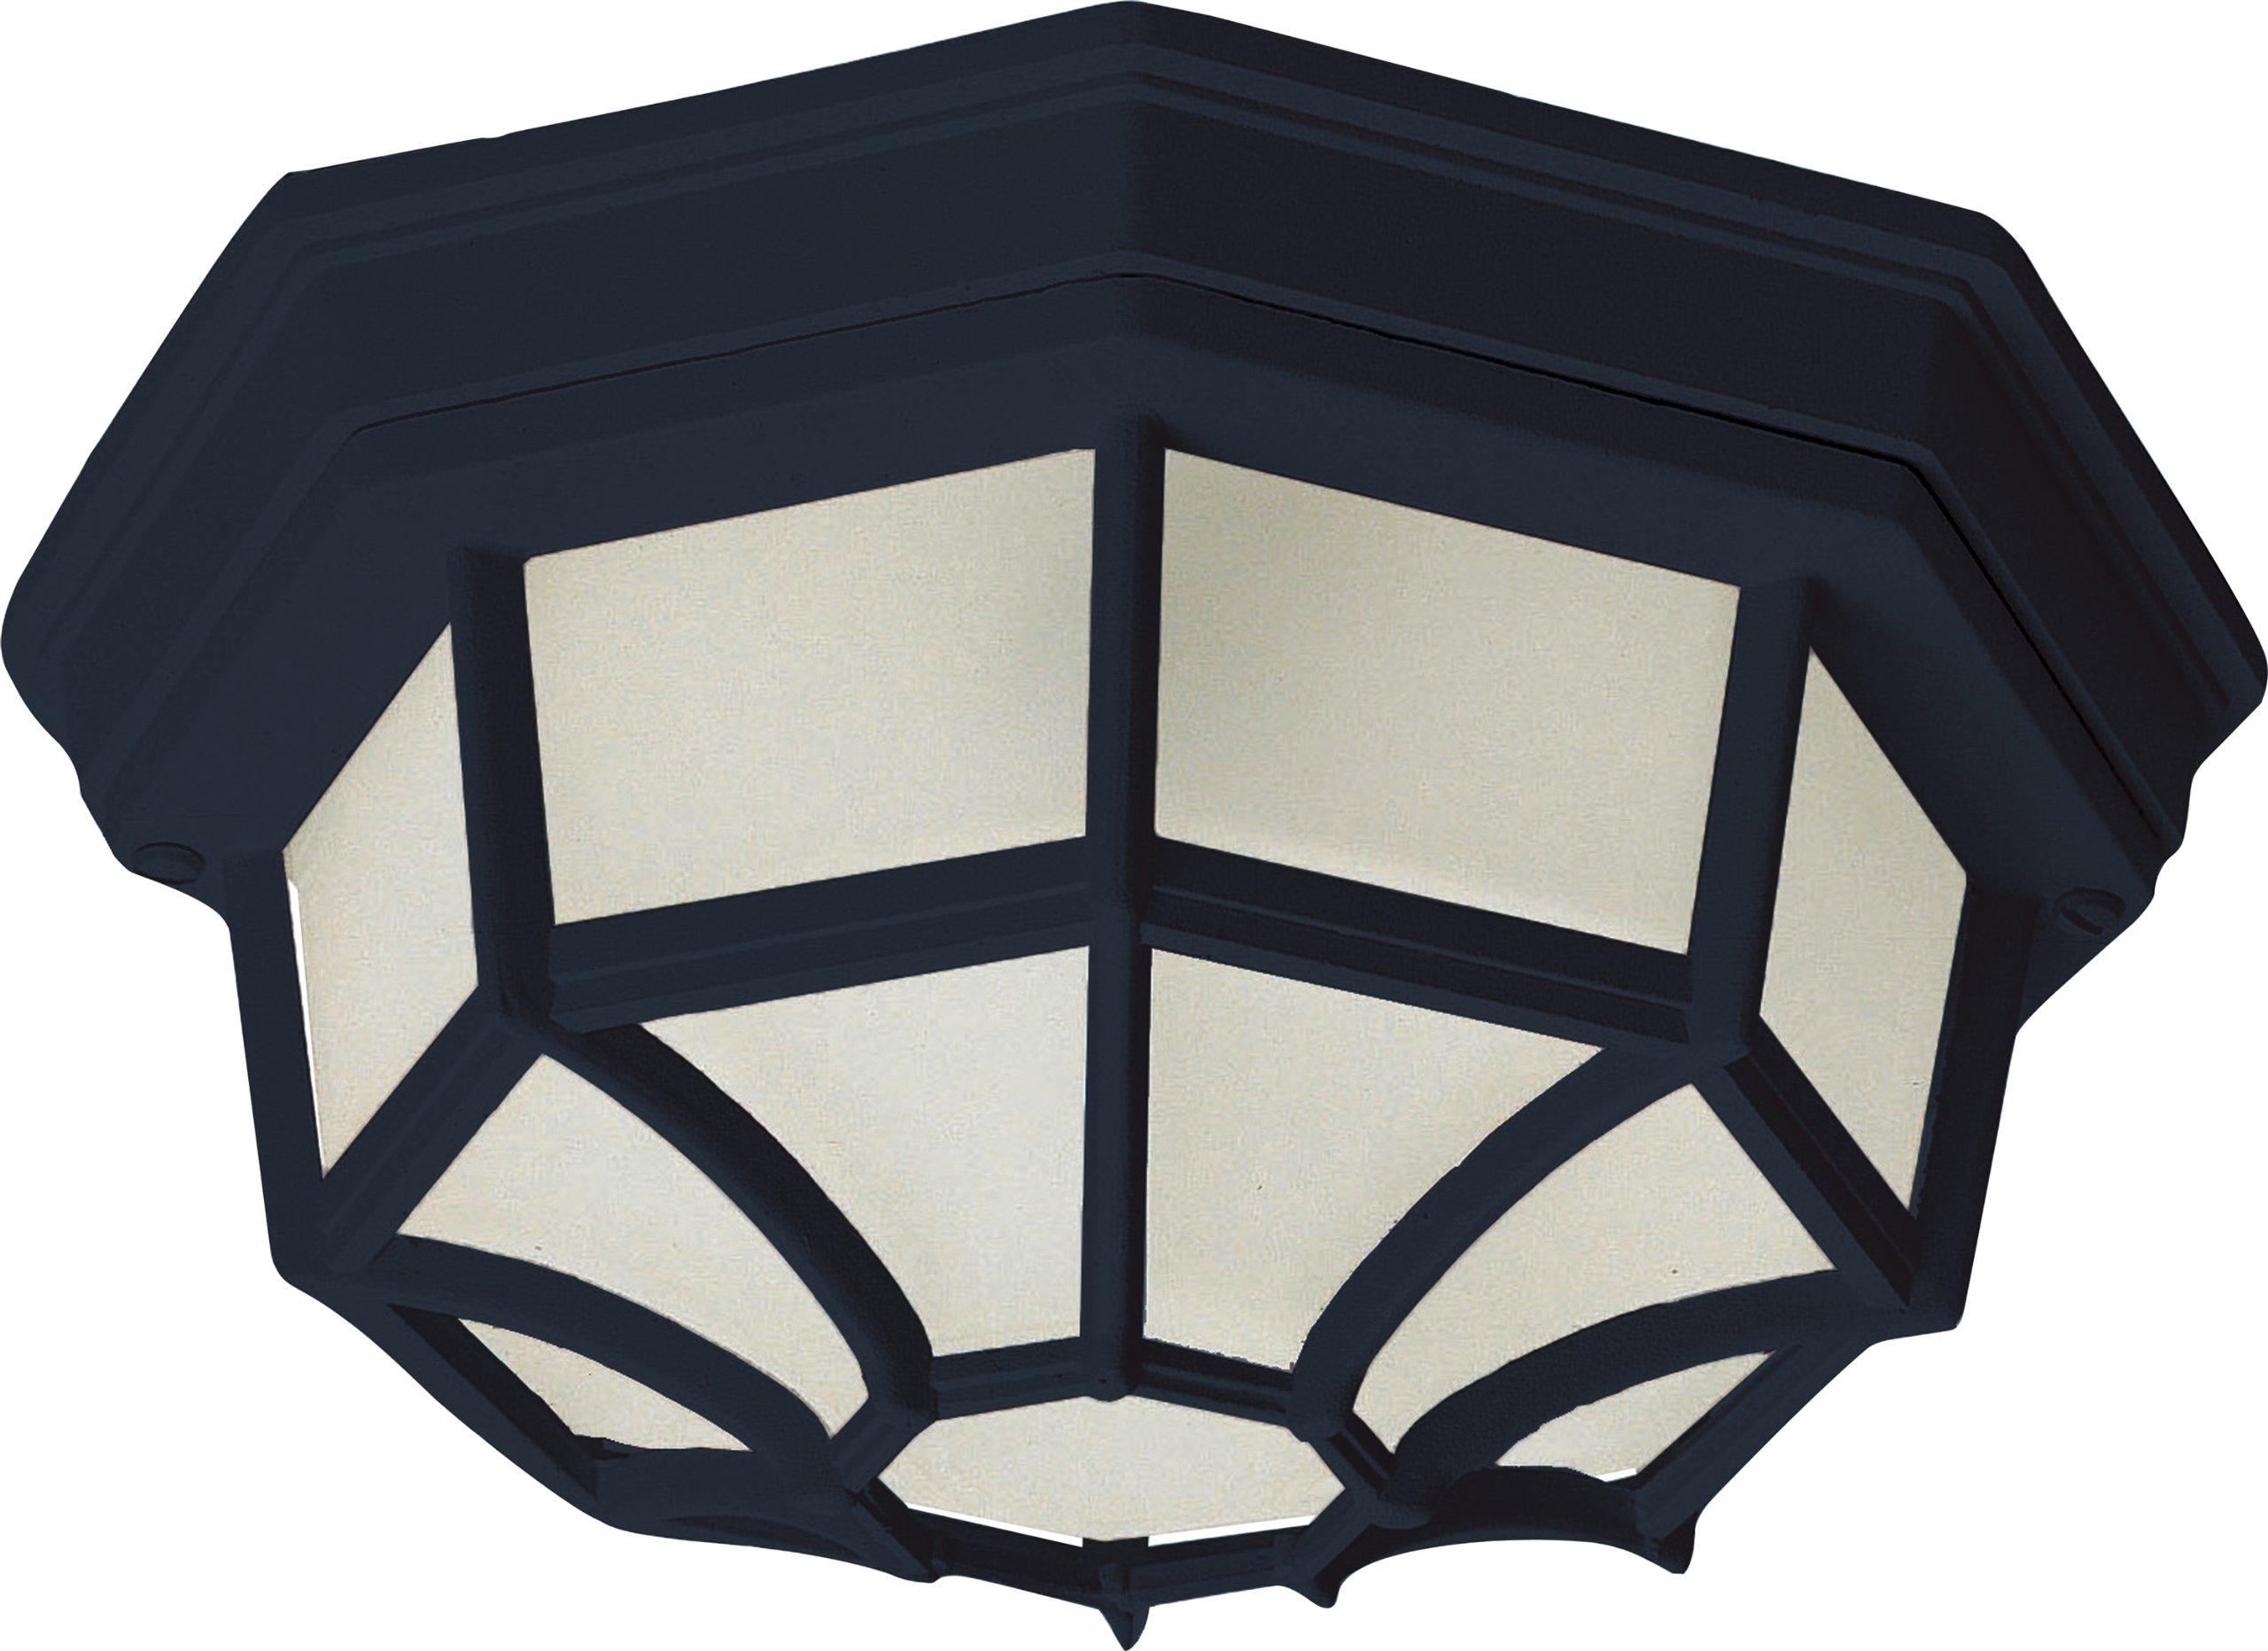 Maxim Lighting 57920 Outdoor LED Flush Mount, Black Finish, 11.5 by 4.5-Inch